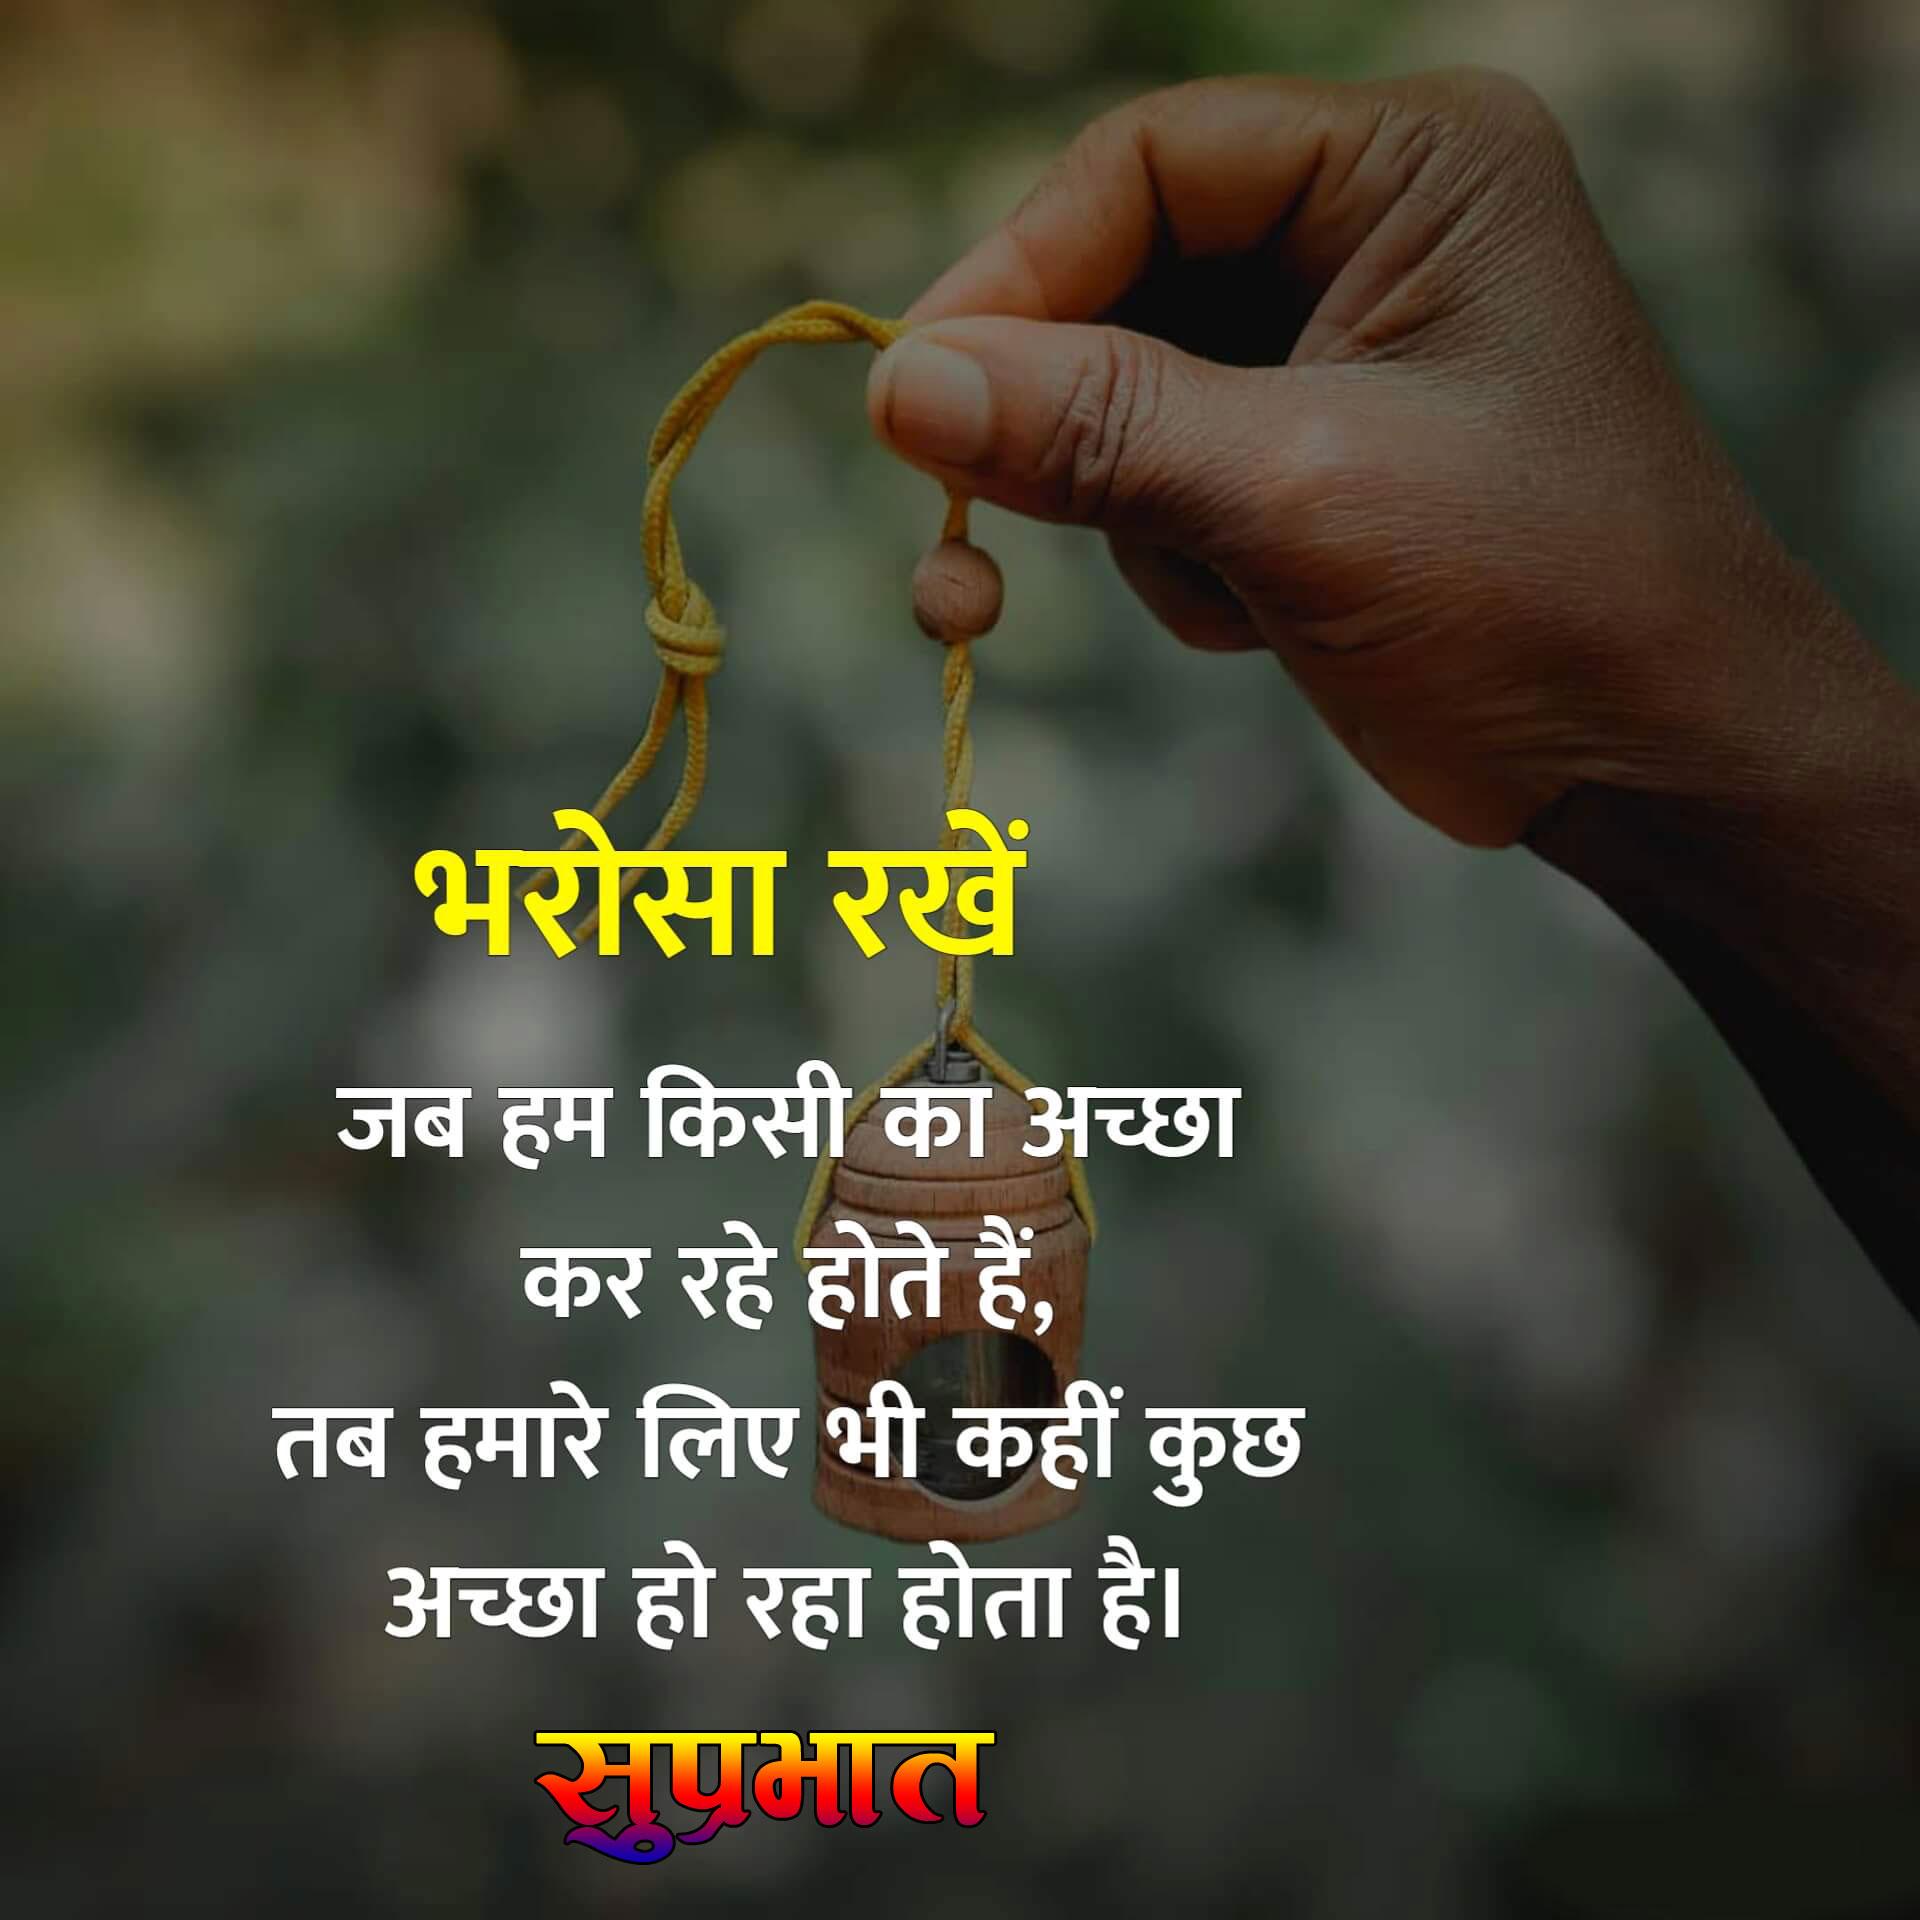 Beautiful Suprabhat Images wallpaper free hd